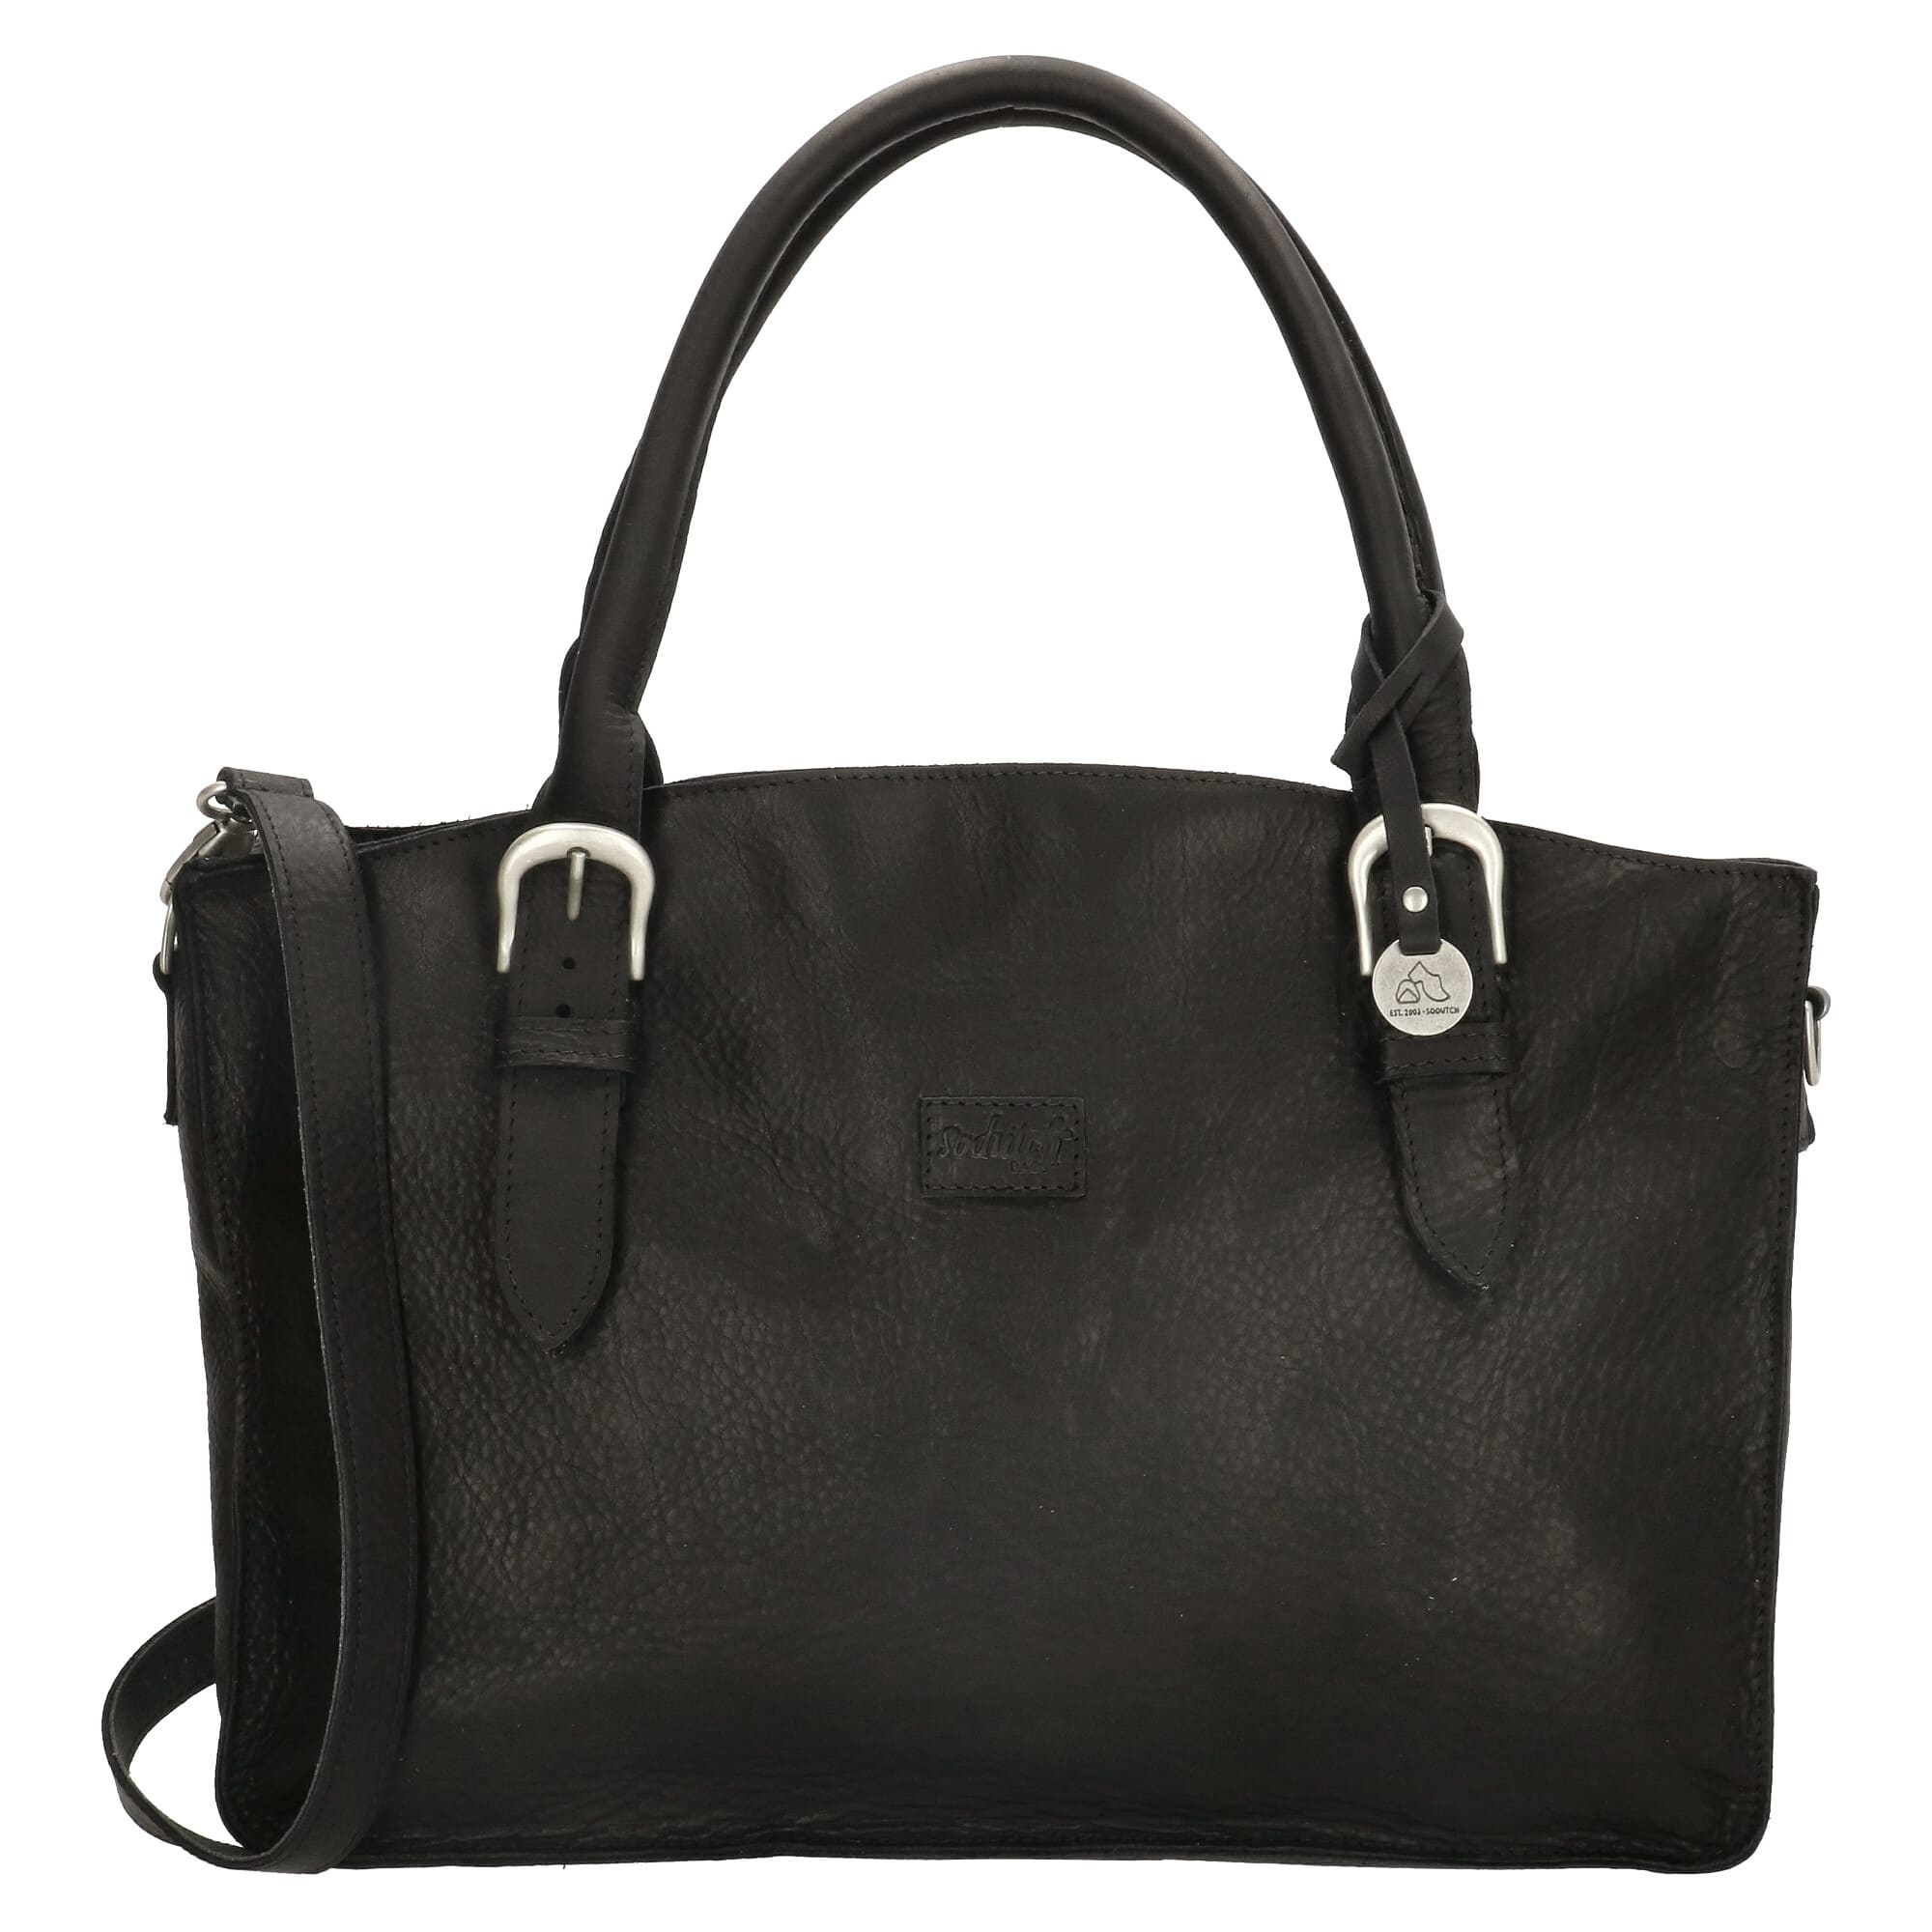 SoDutch Bags Laptoptas #09 Zwart